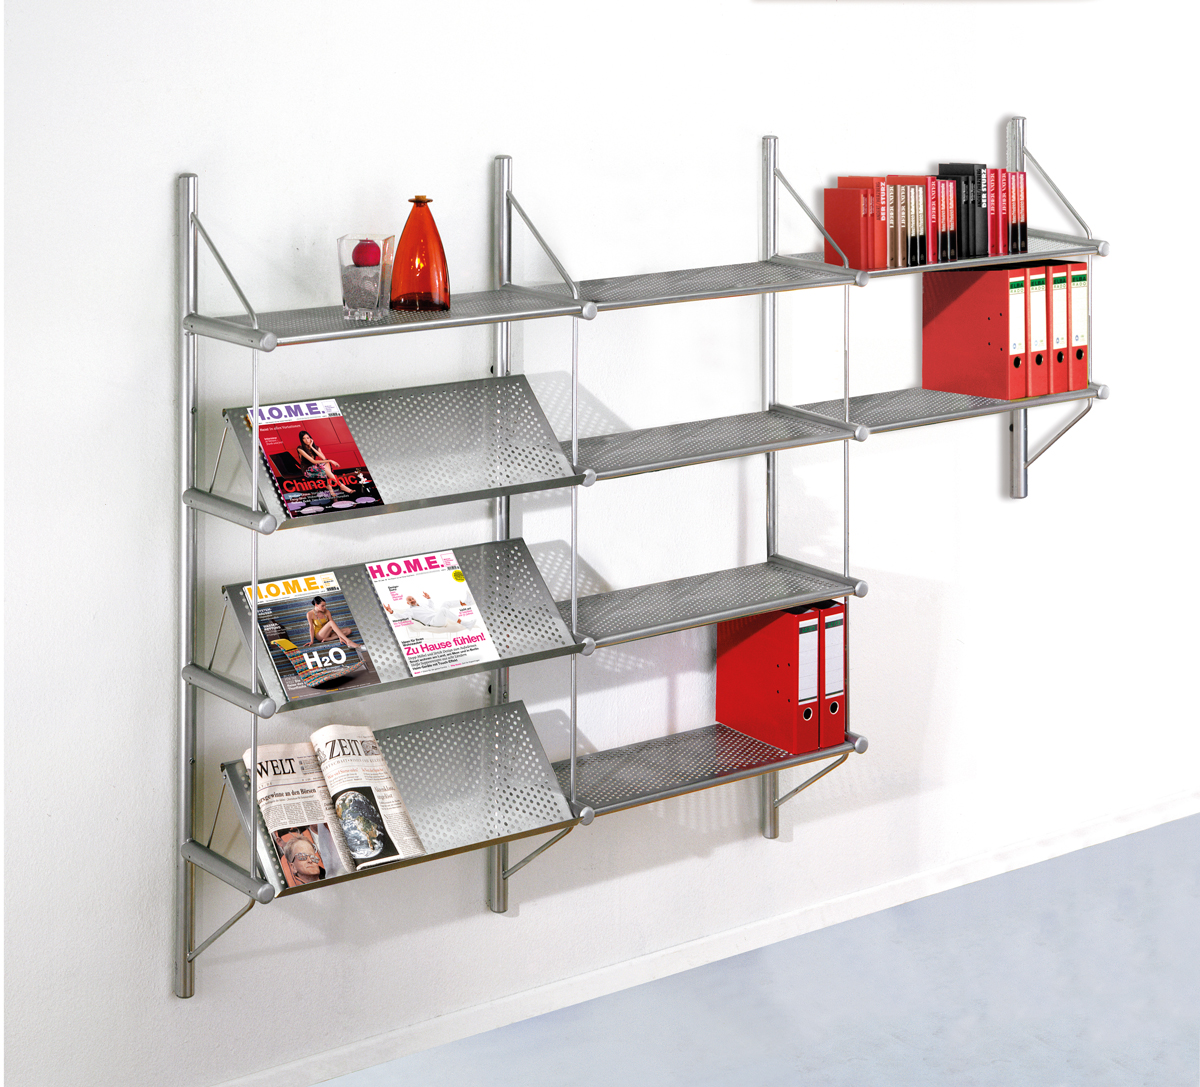 Design-Regal topline | Kerkmann Office Design – Büromöbel aus Bielefeld